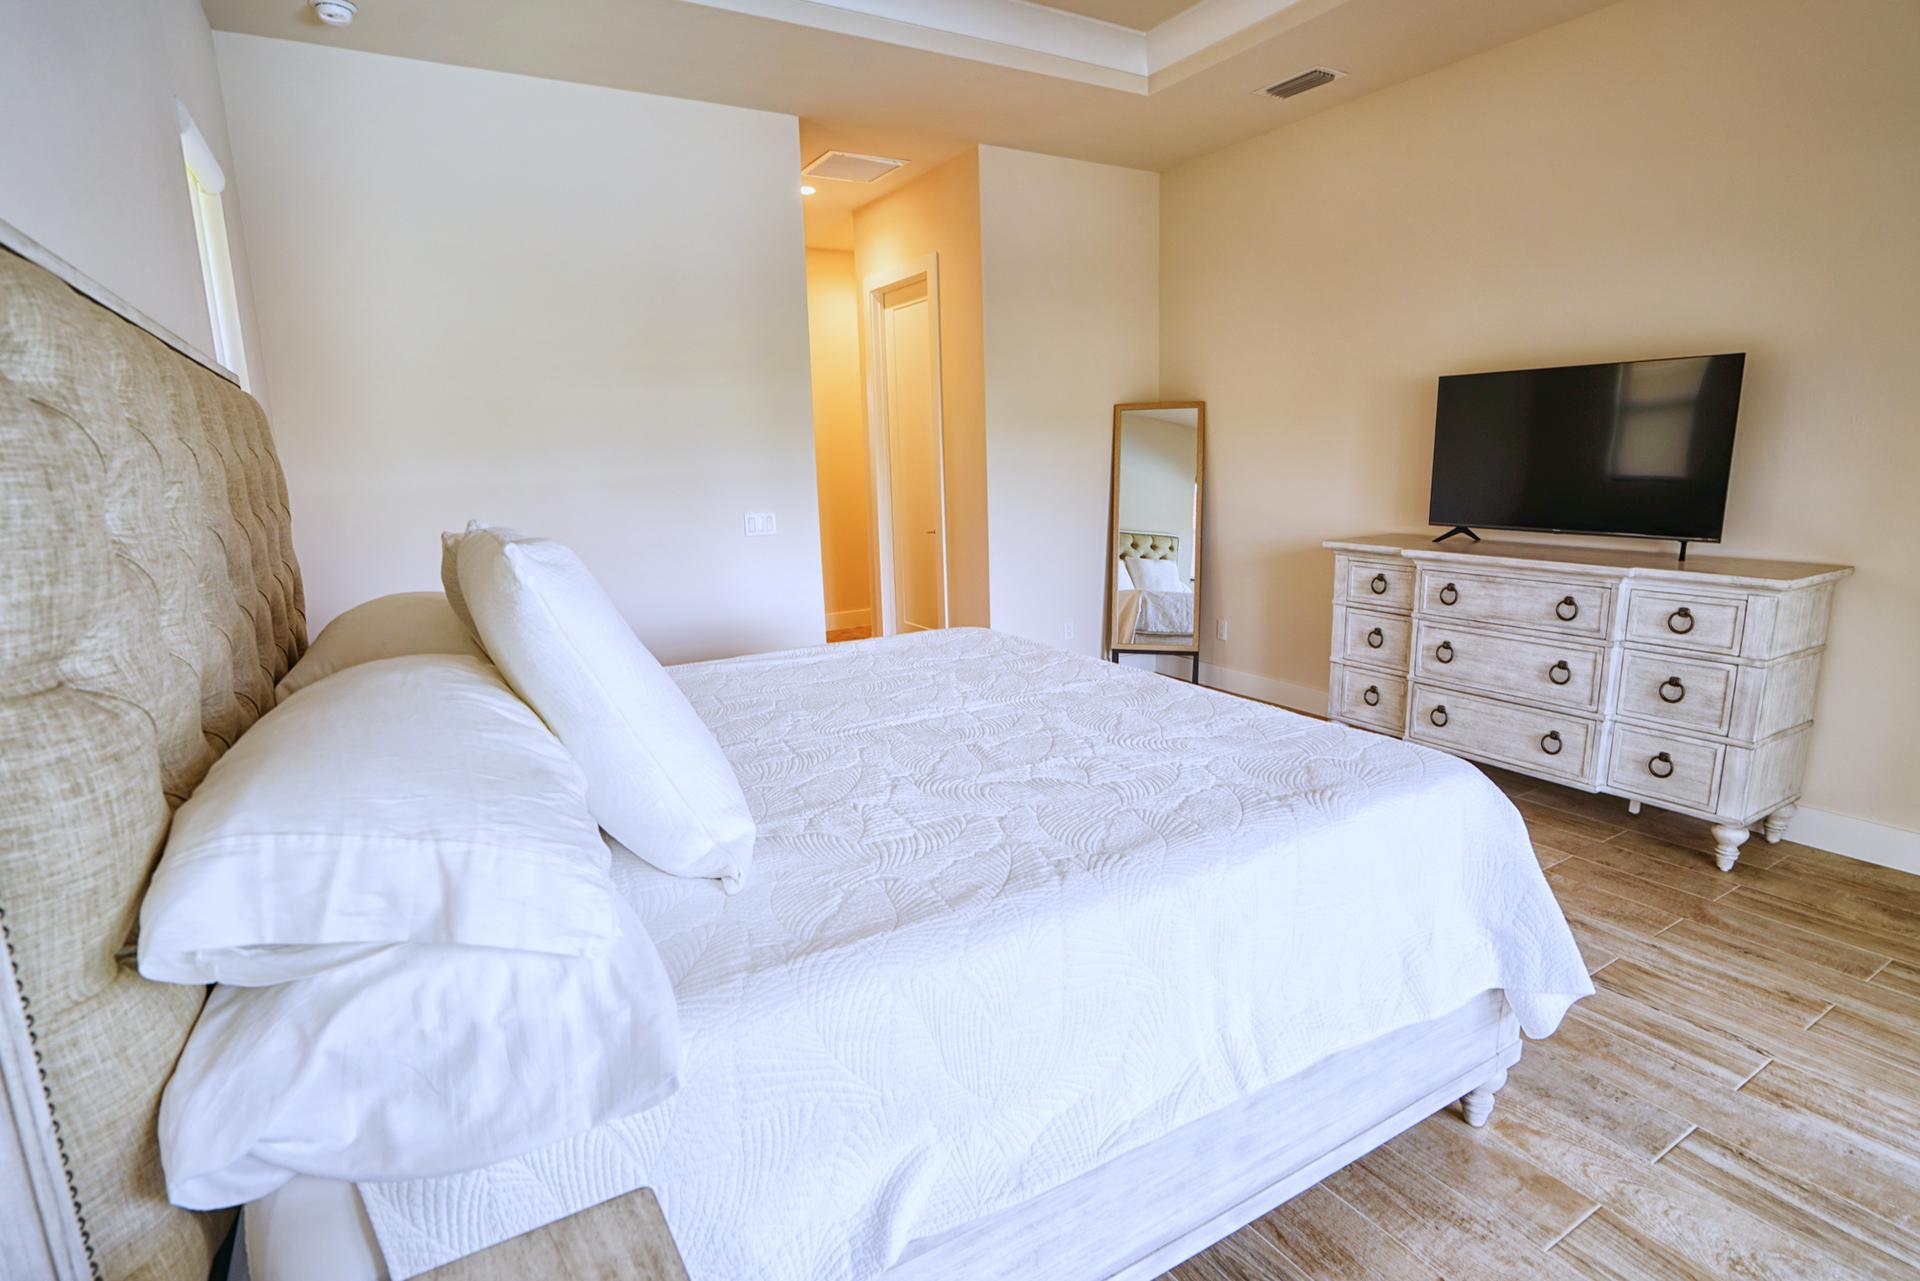 Bedrooms in Florida